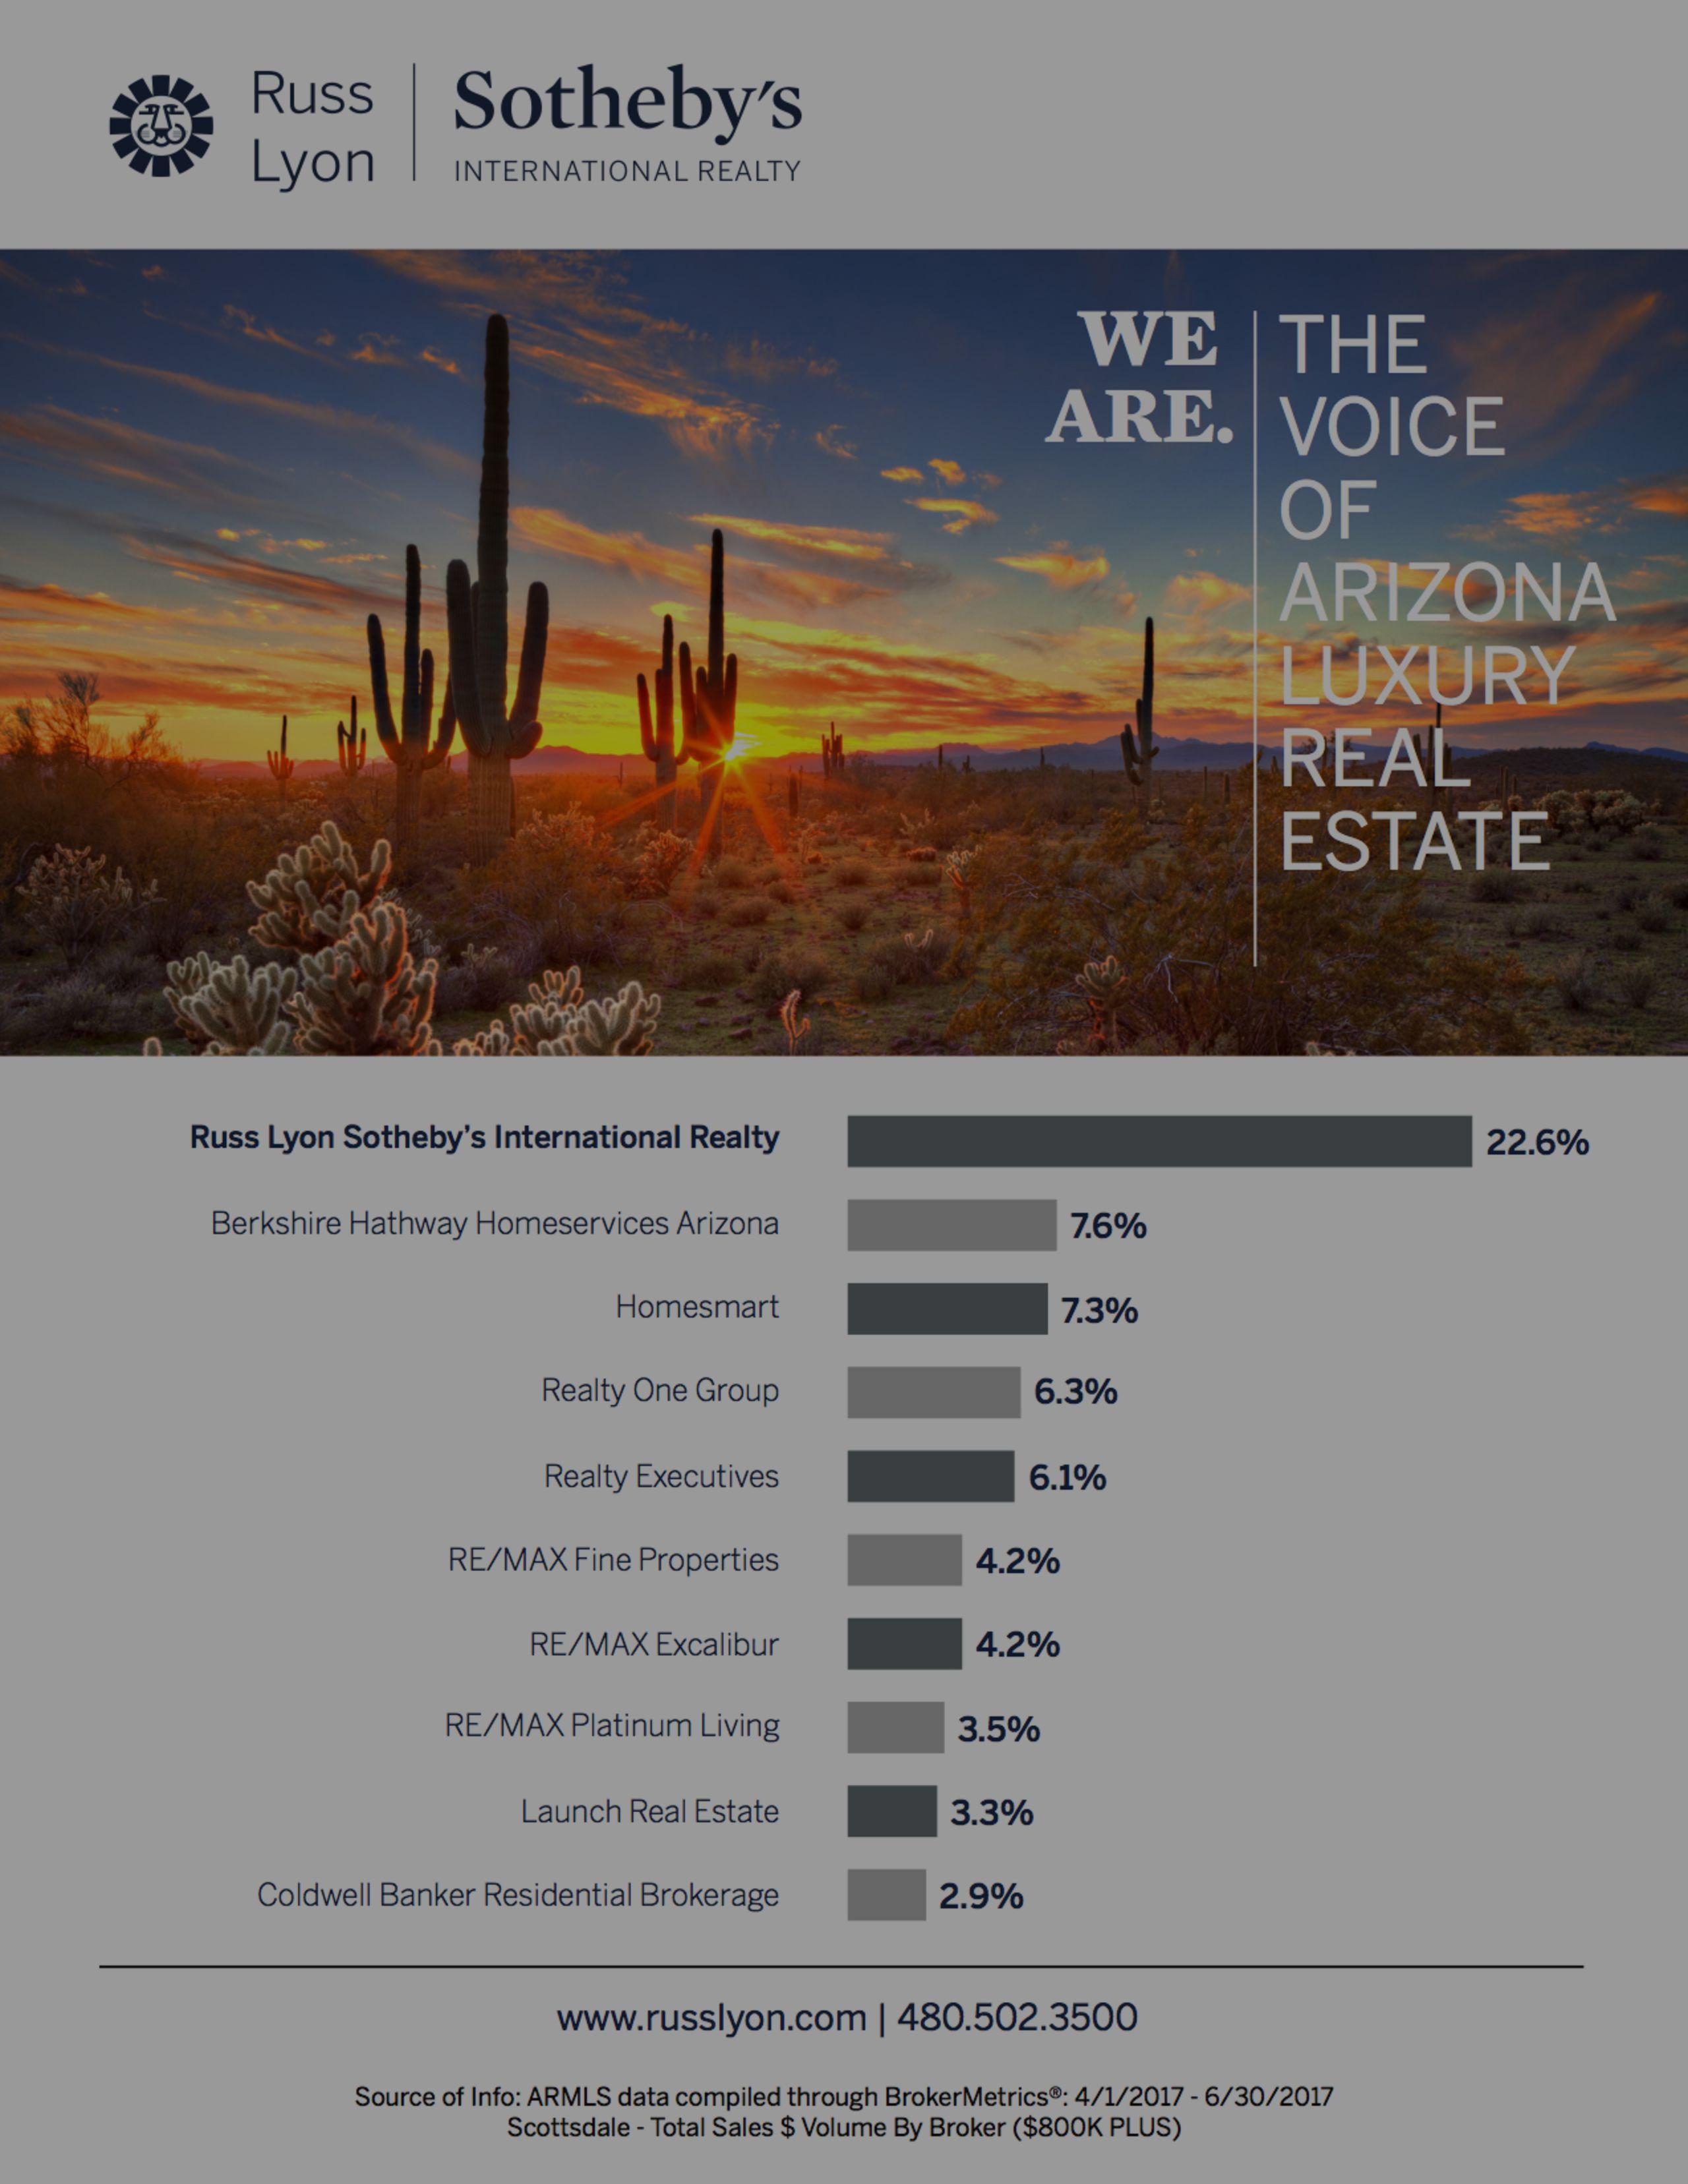 Market Share Scottsdale 2nd Quarter 2017